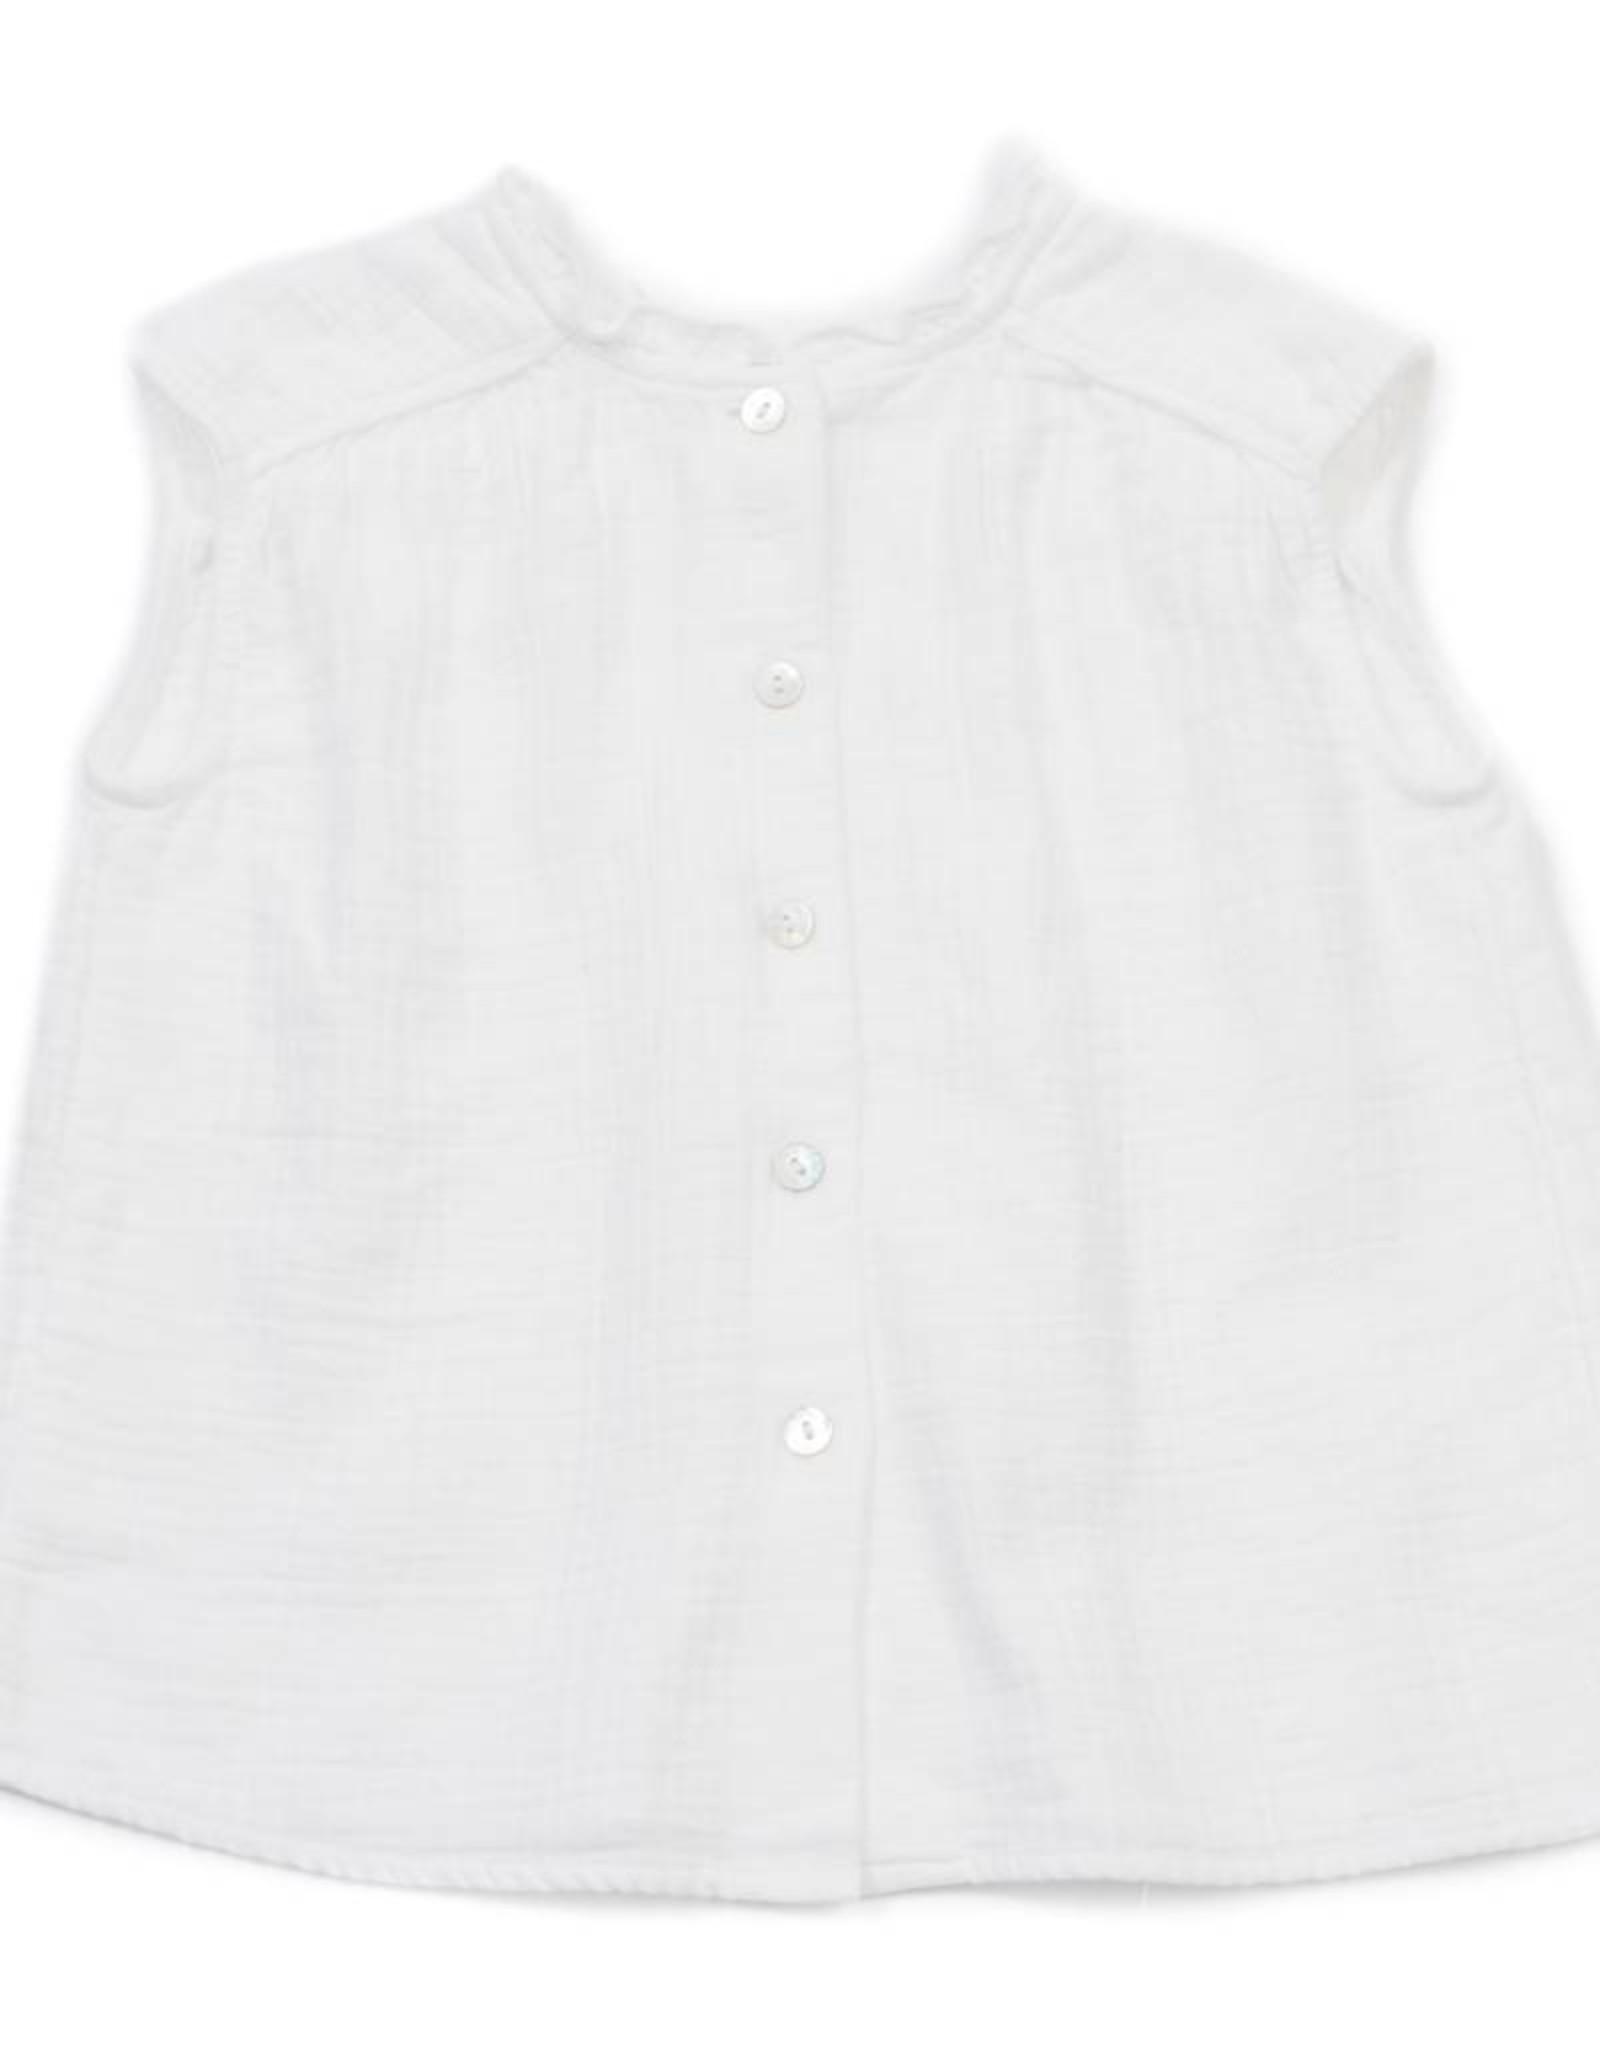 Looping blouse